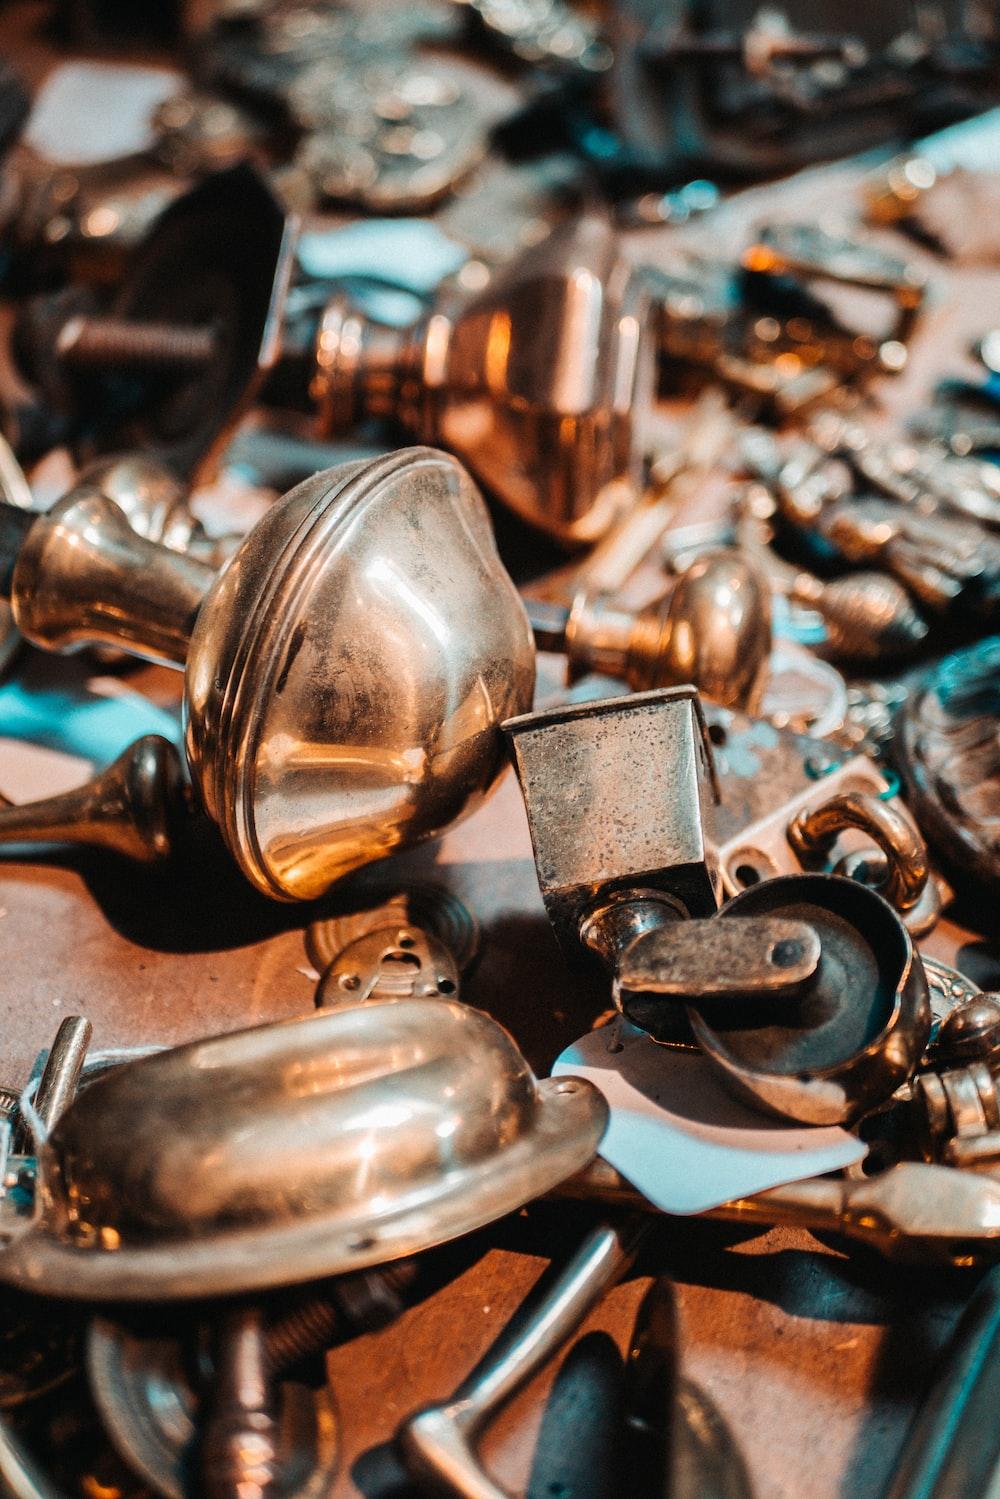 brass door knob and caster wheel lot